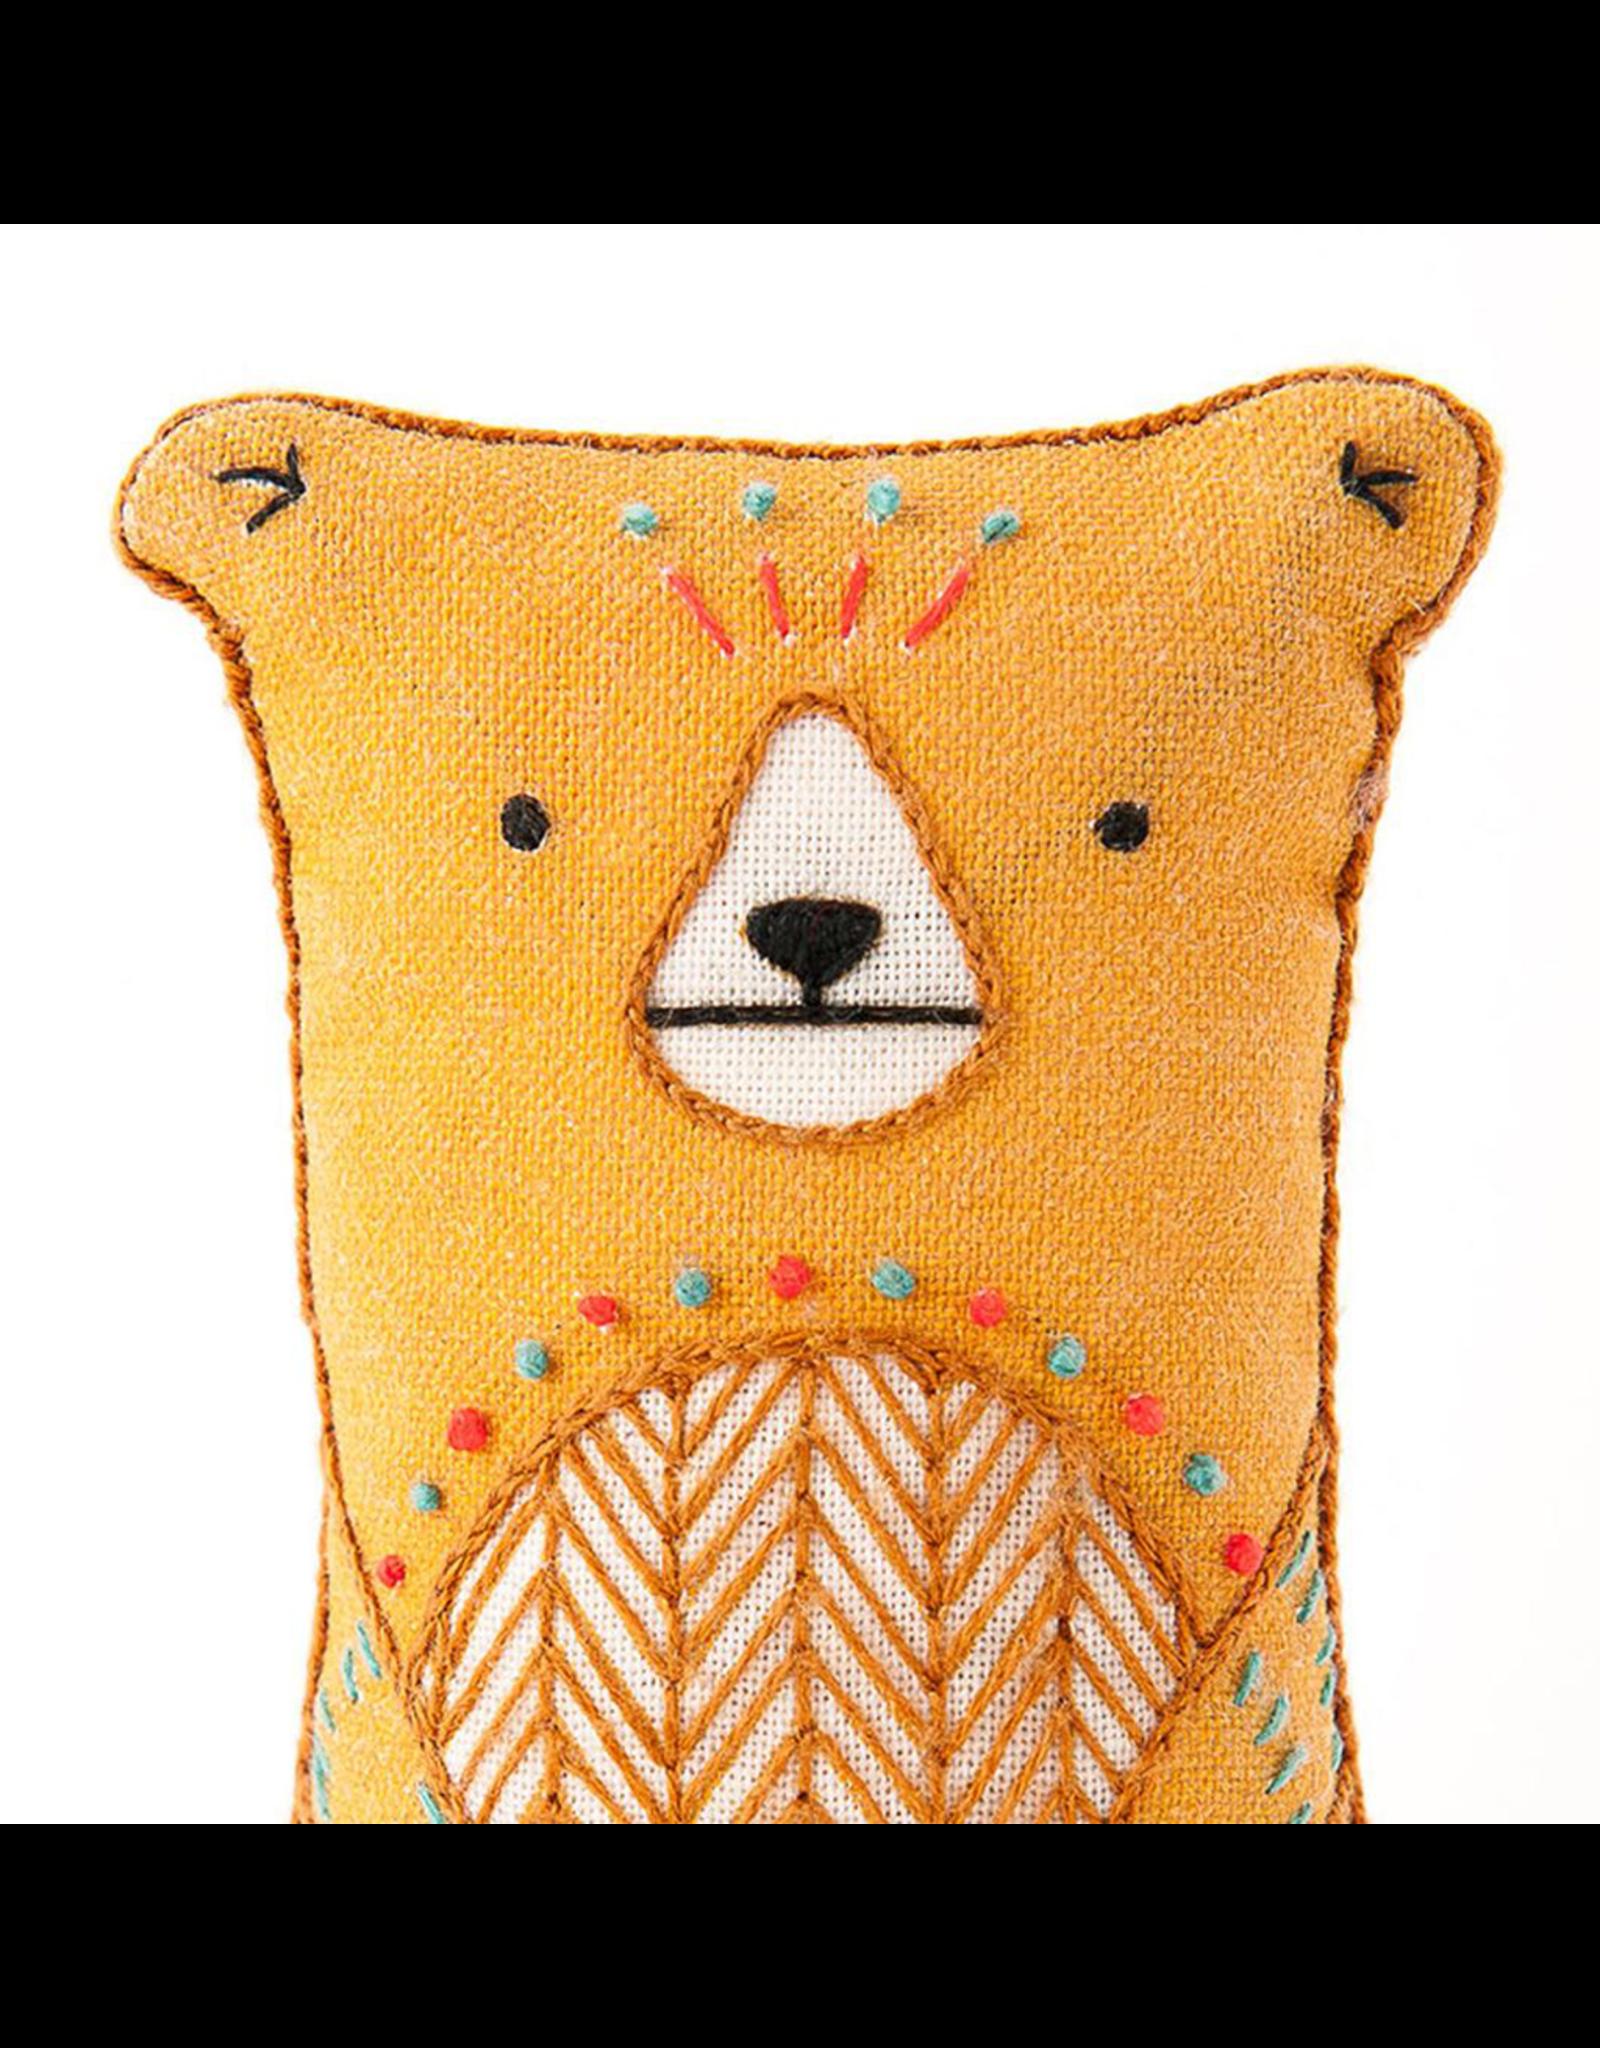 Embroidery Kit - Bear